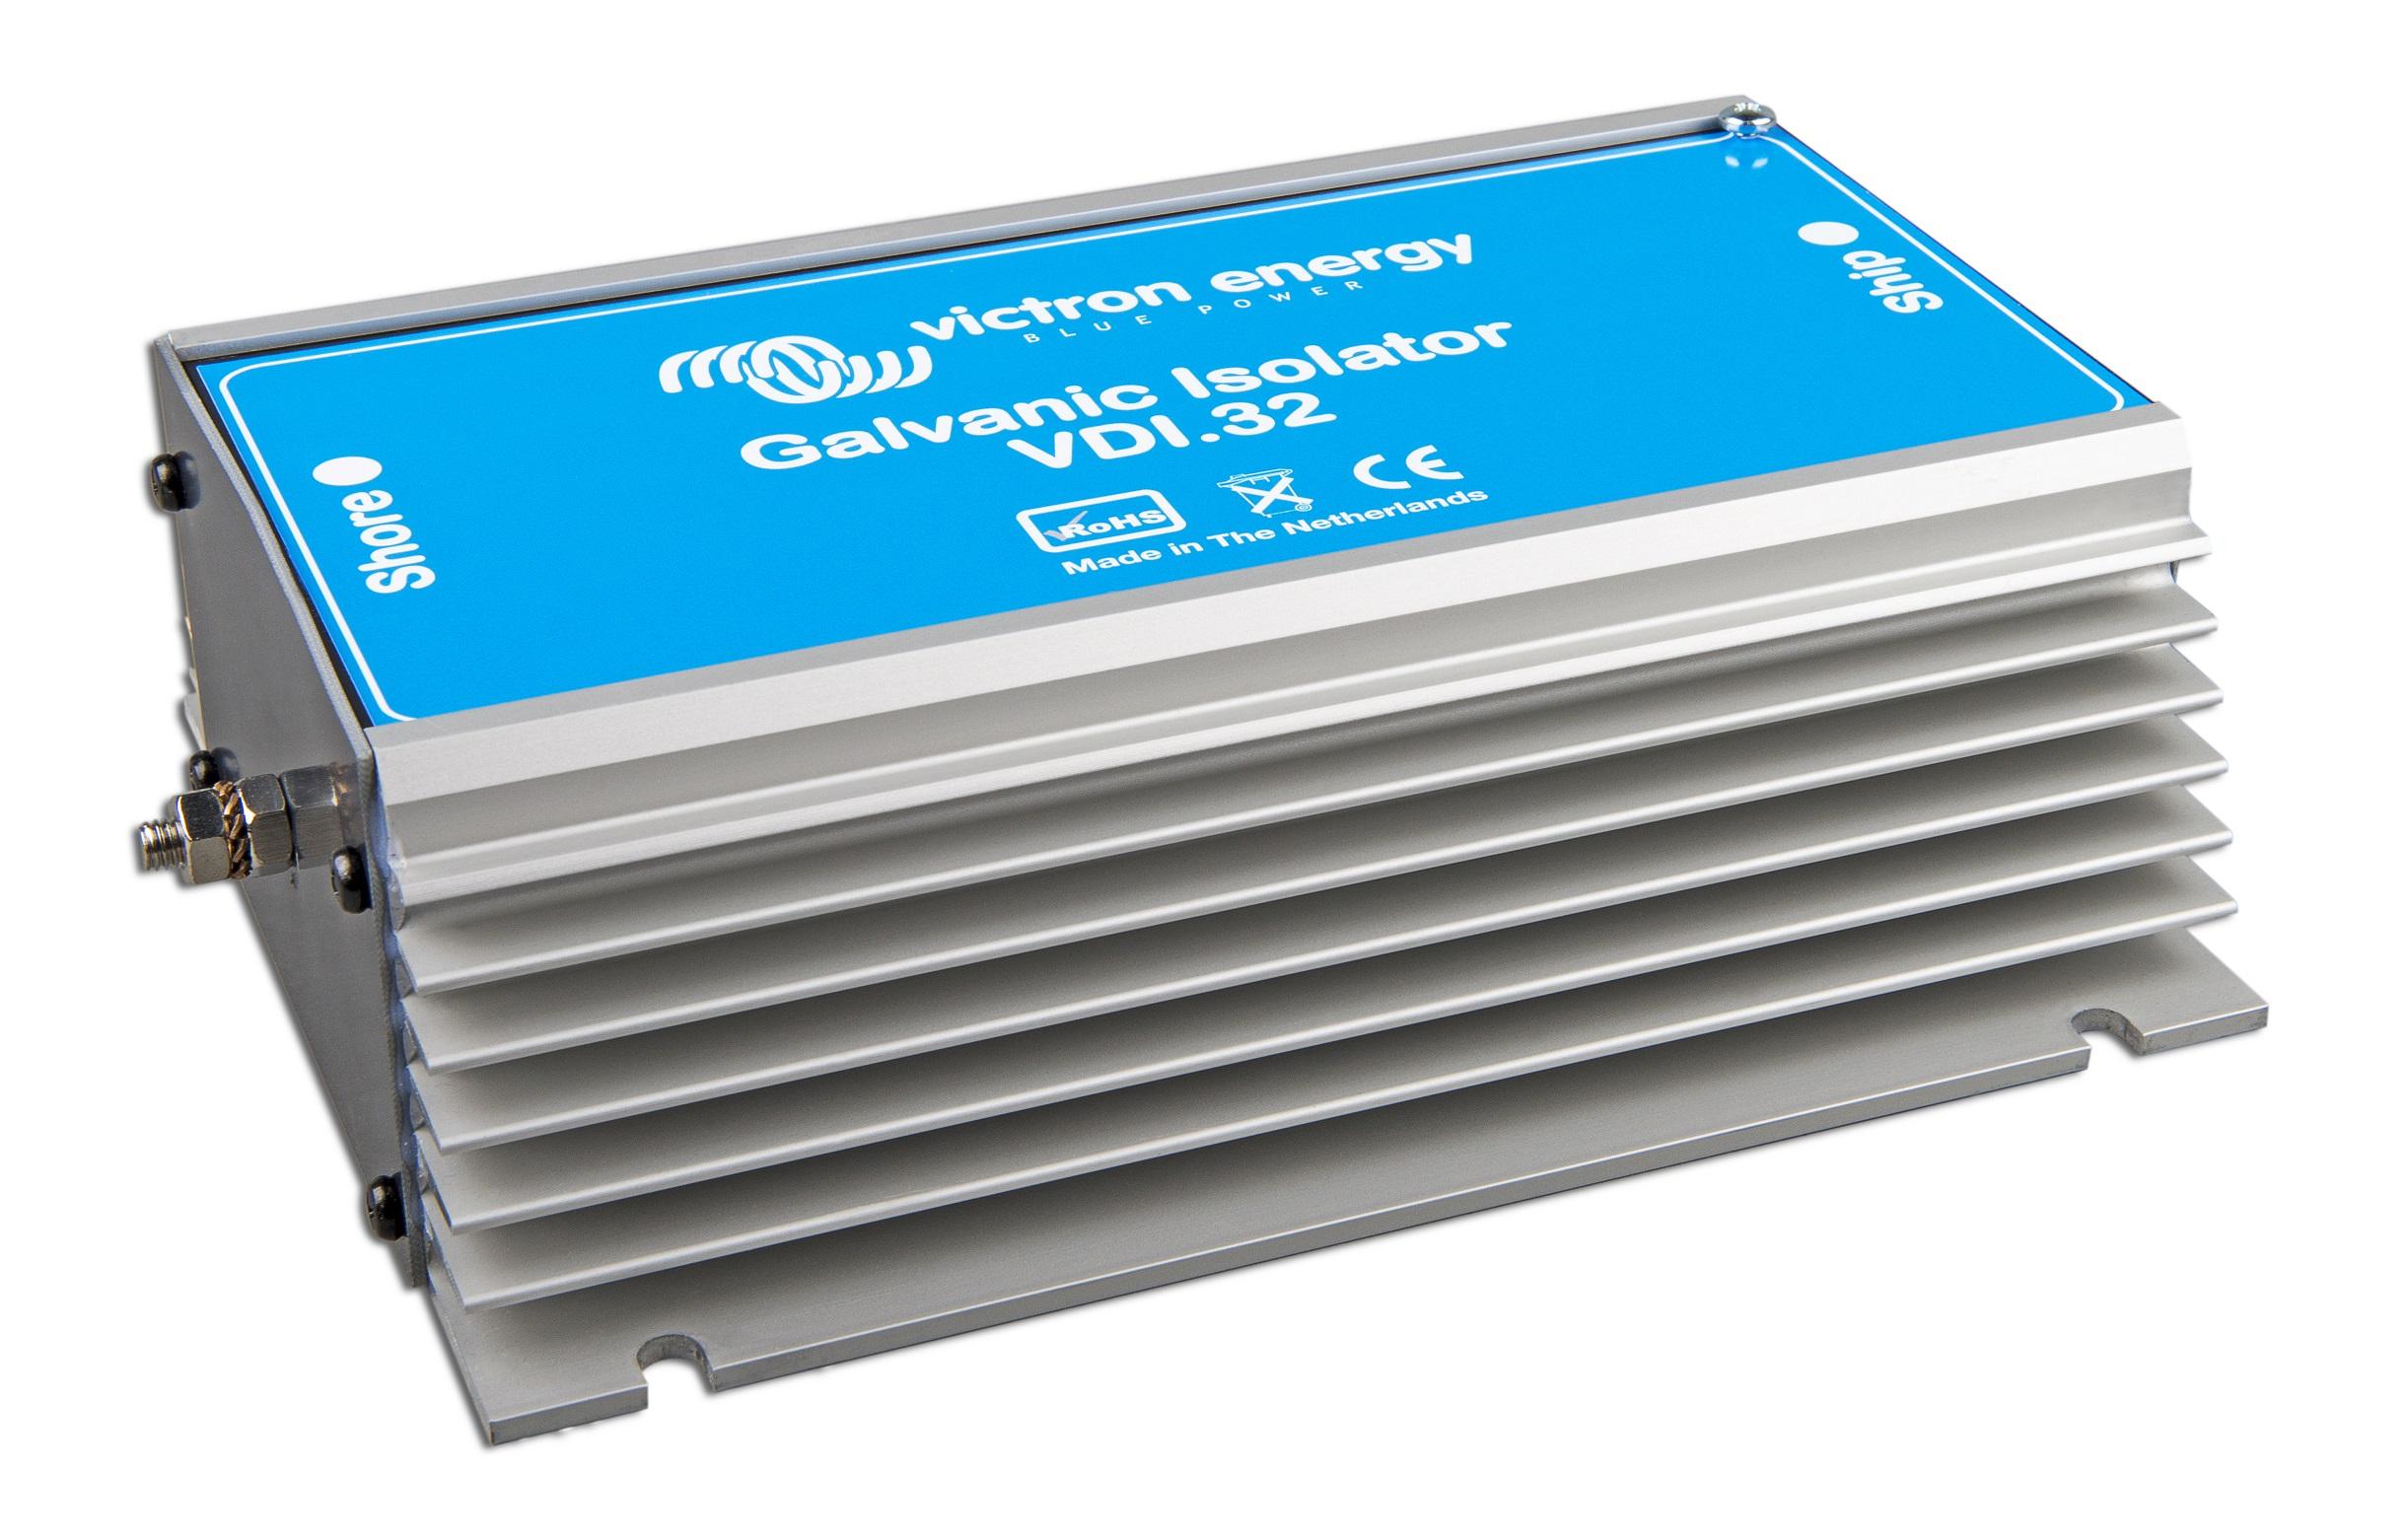 Galvanic Isolator VDI 32_side